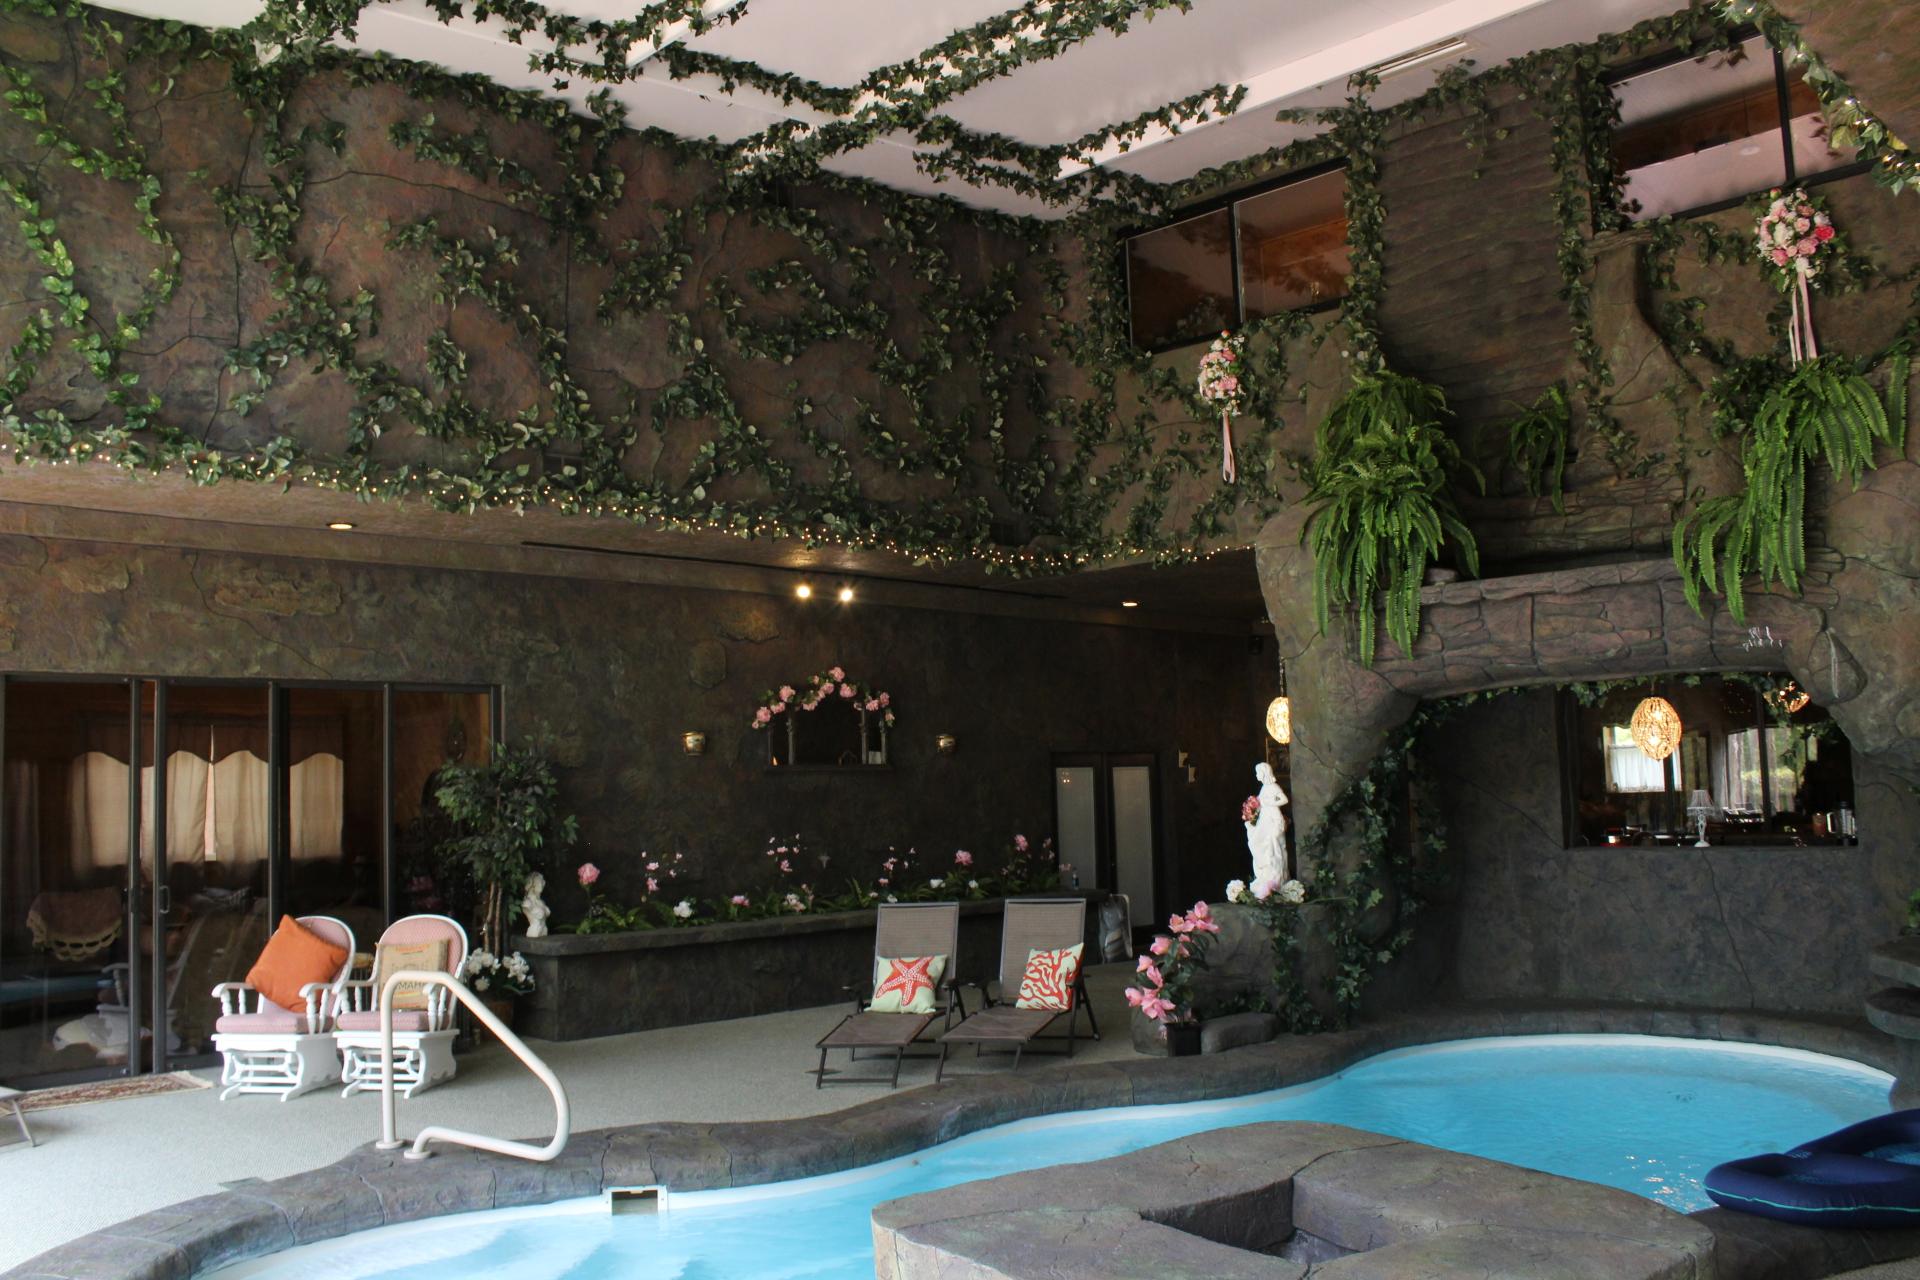 Vacation Rentals near crystalriver florida